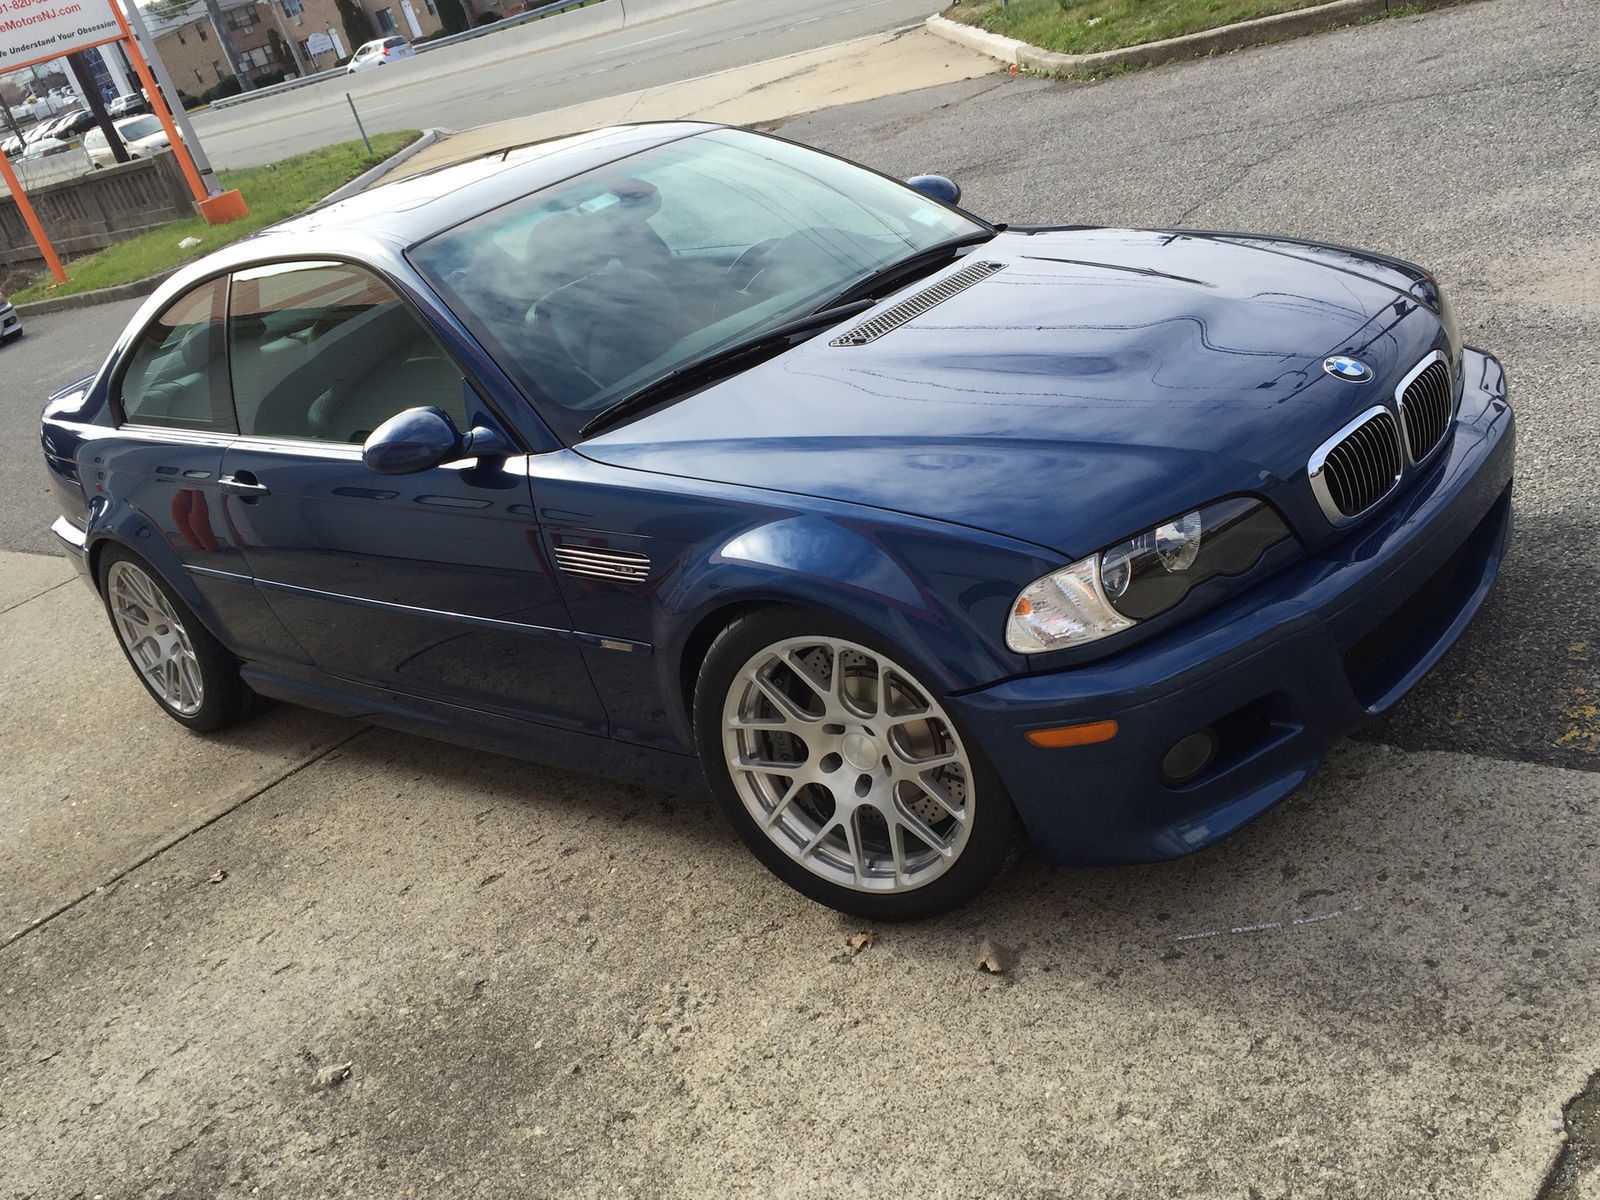 2004 BMW M3 | BMW E46 M3 on Forgeline One PIece Forged Monoblock SE1 Wheels